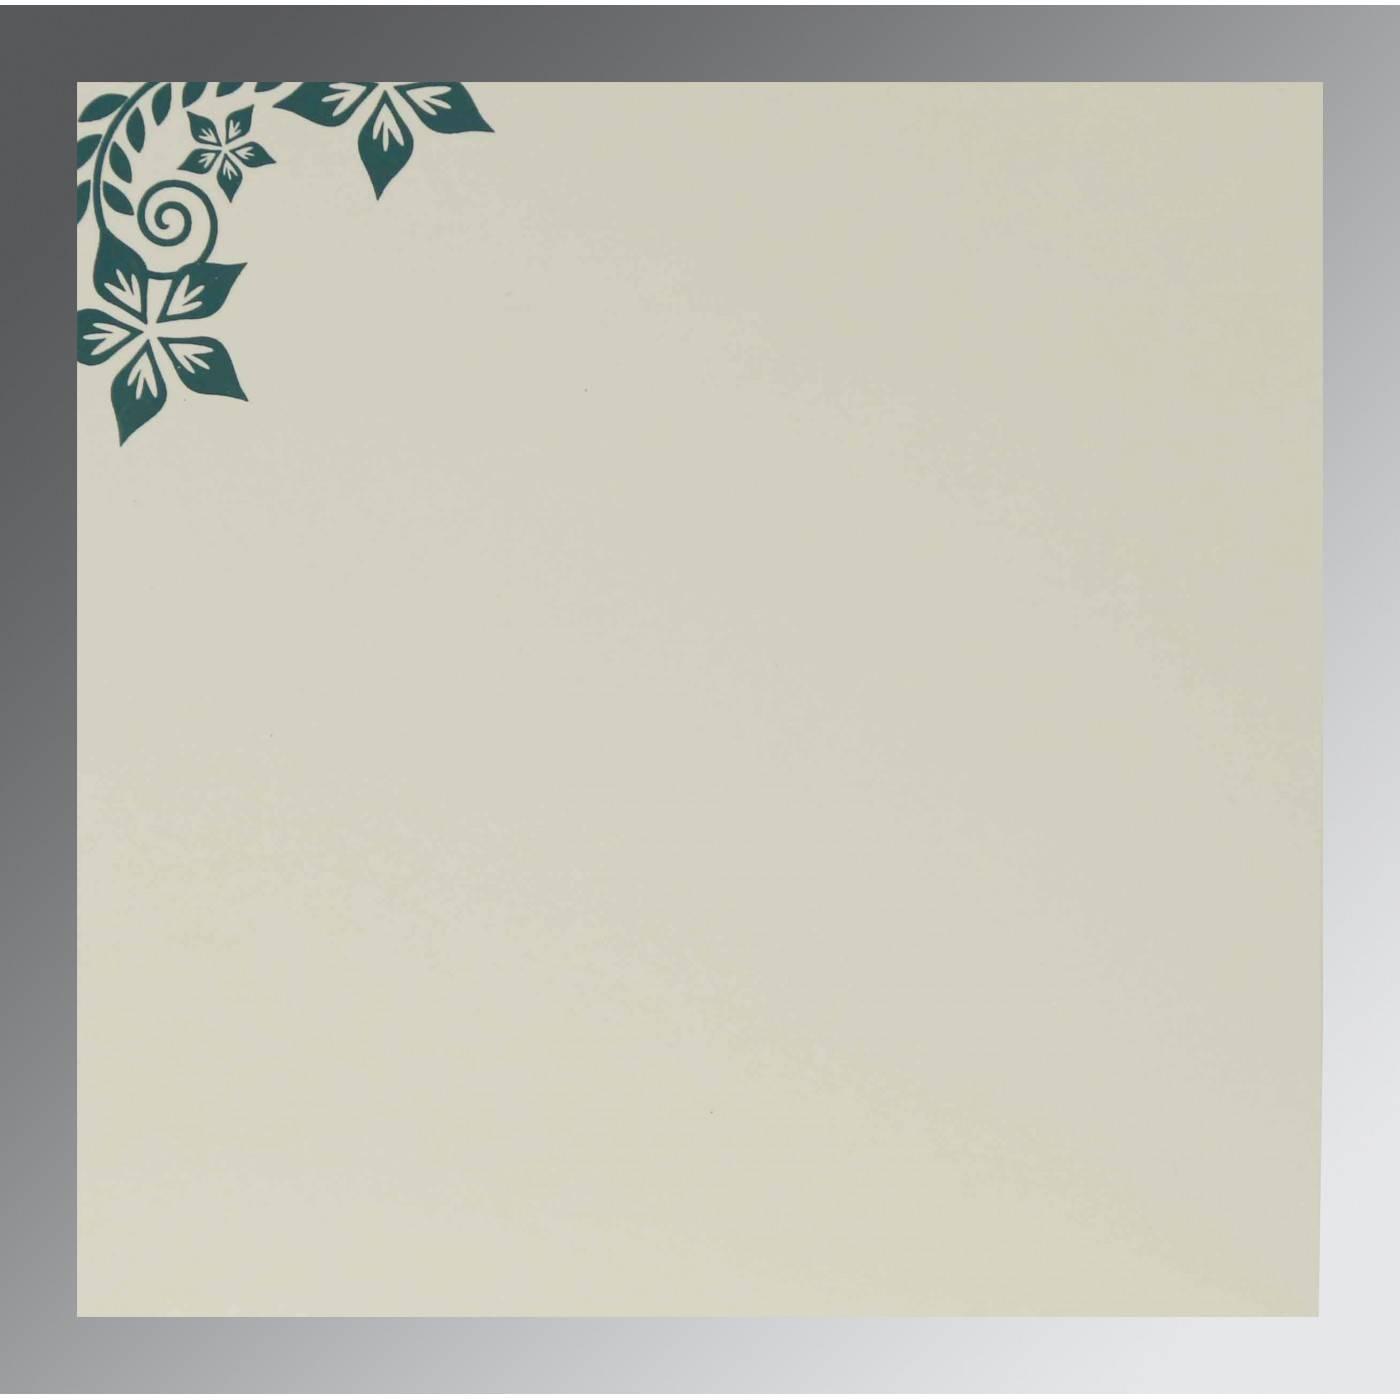 MIDNIGHT GREEN MATTE FLORAL THEMED - SCREEN PRINTED WEDDING INVITATION : CSO-8240N - IndianWeddingCards